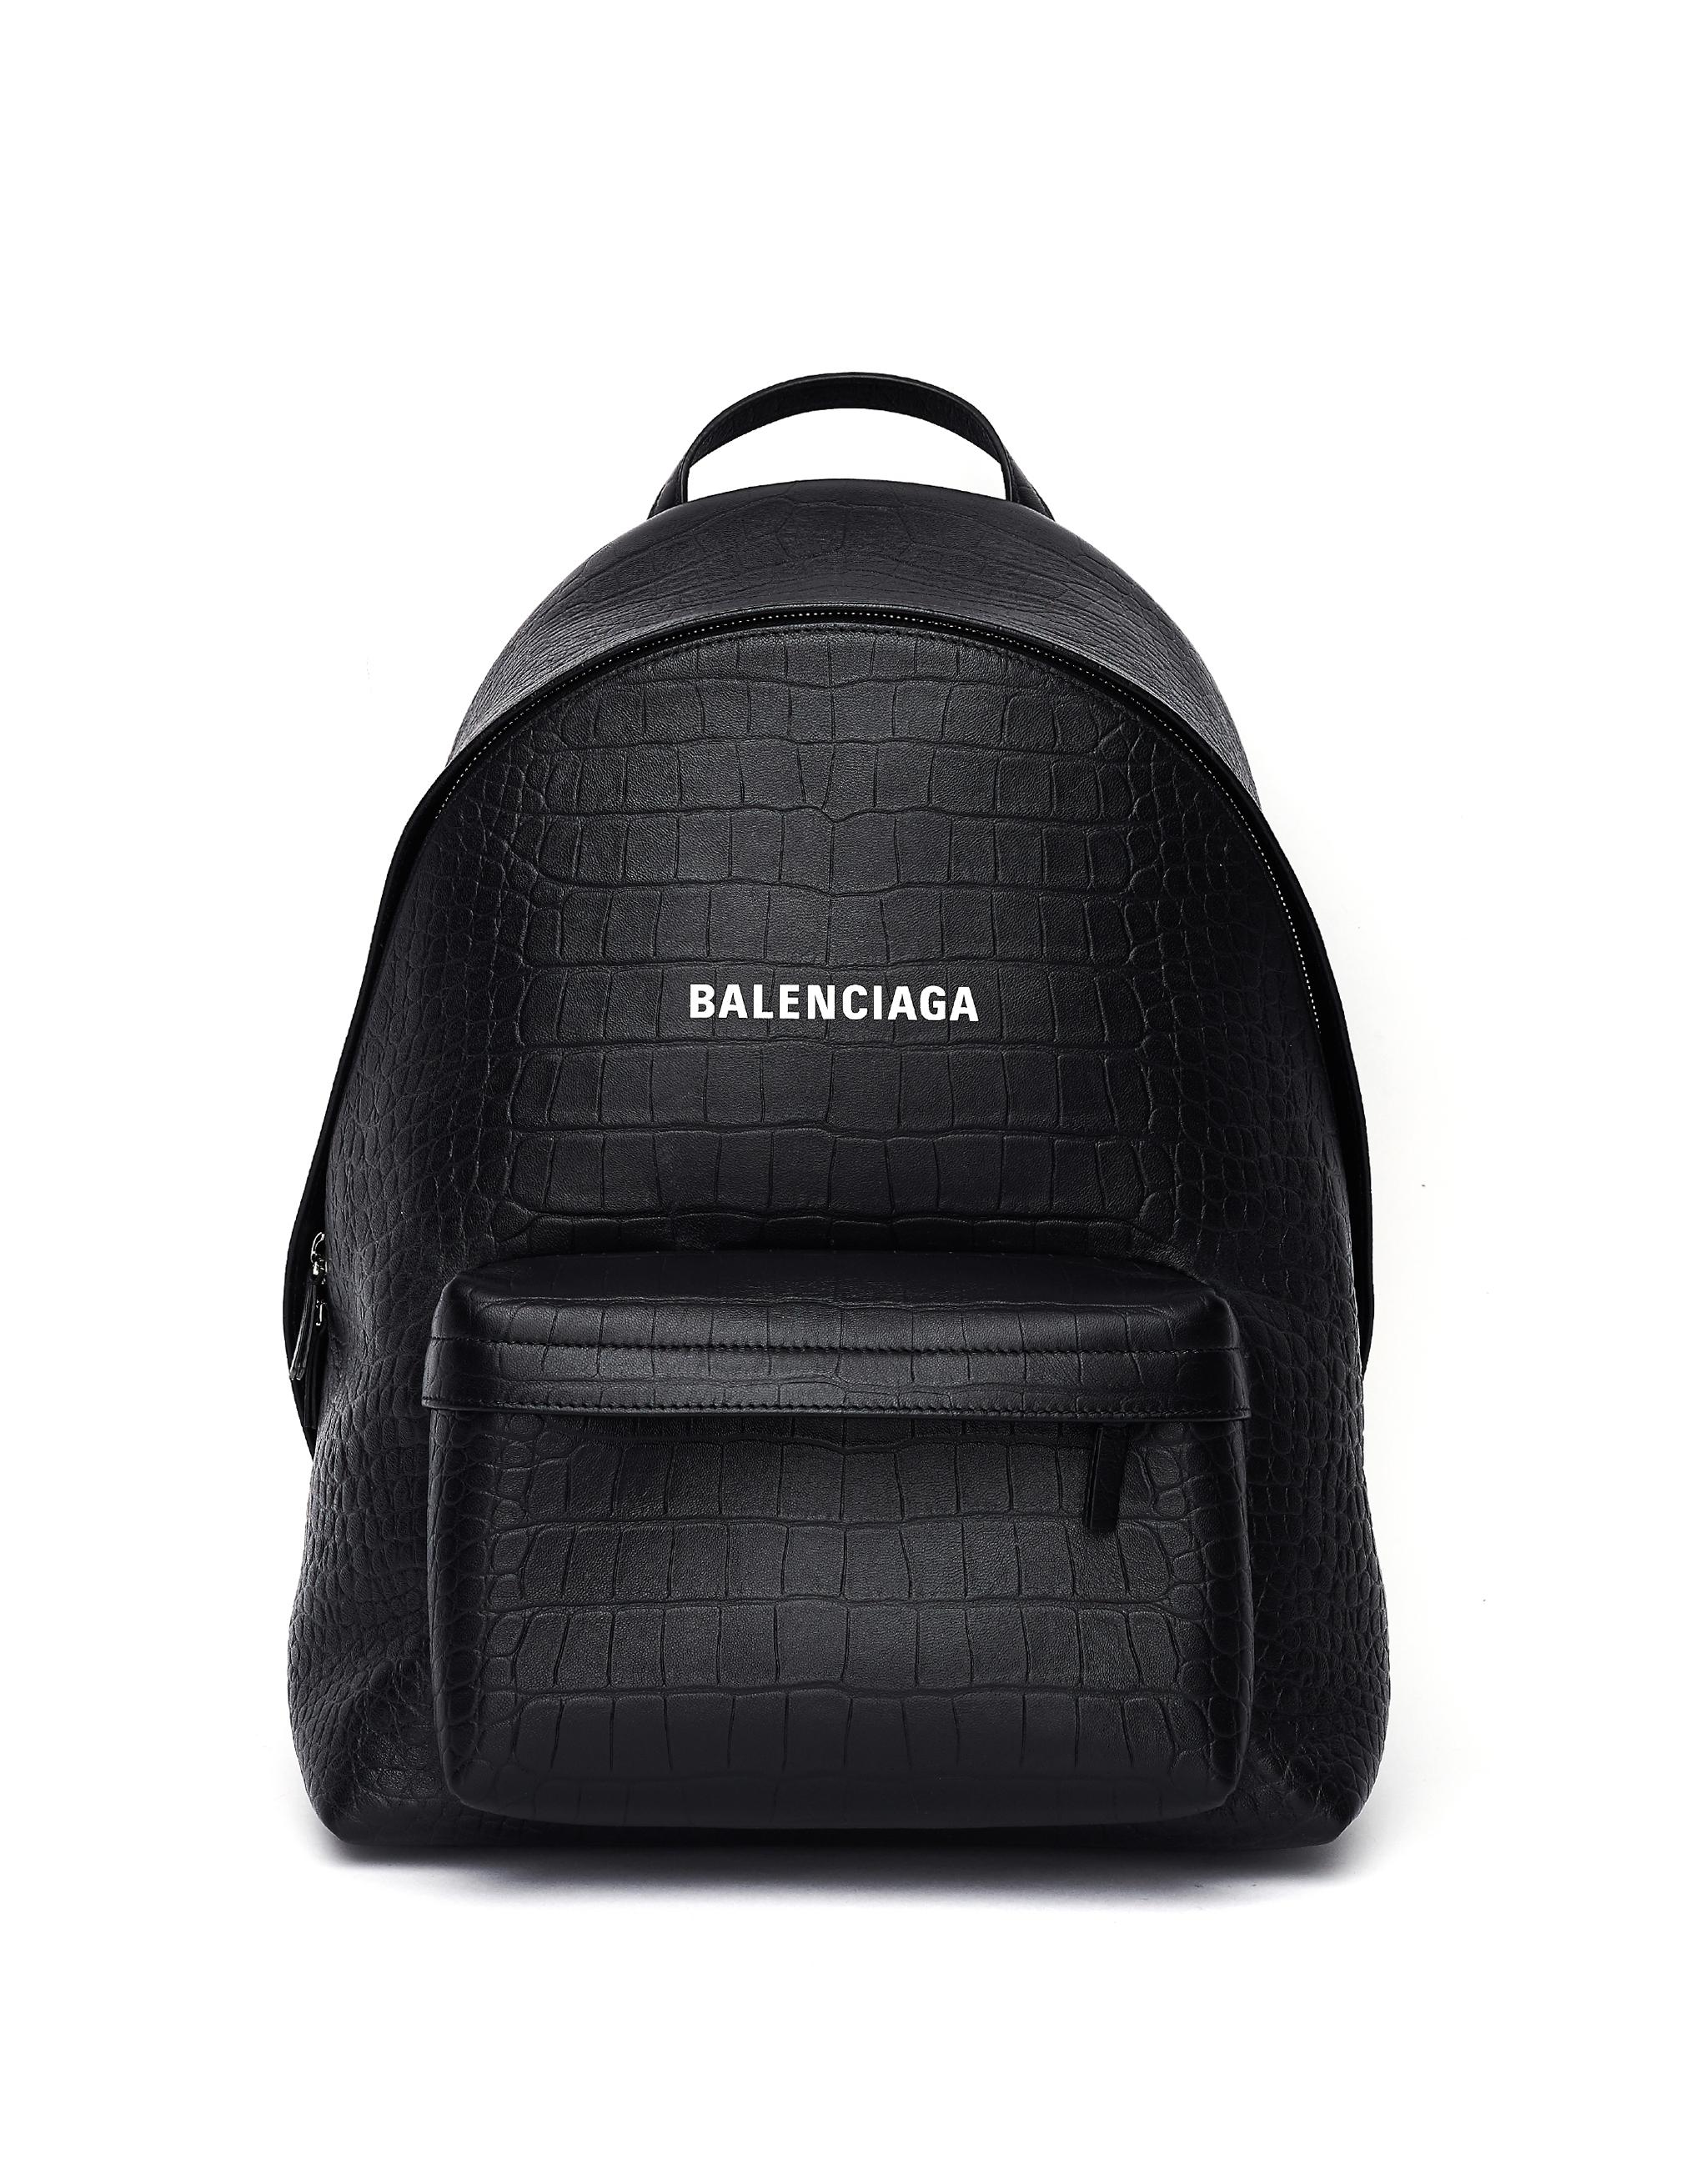 Balenciaga Black Leather Logo Printed Backpack